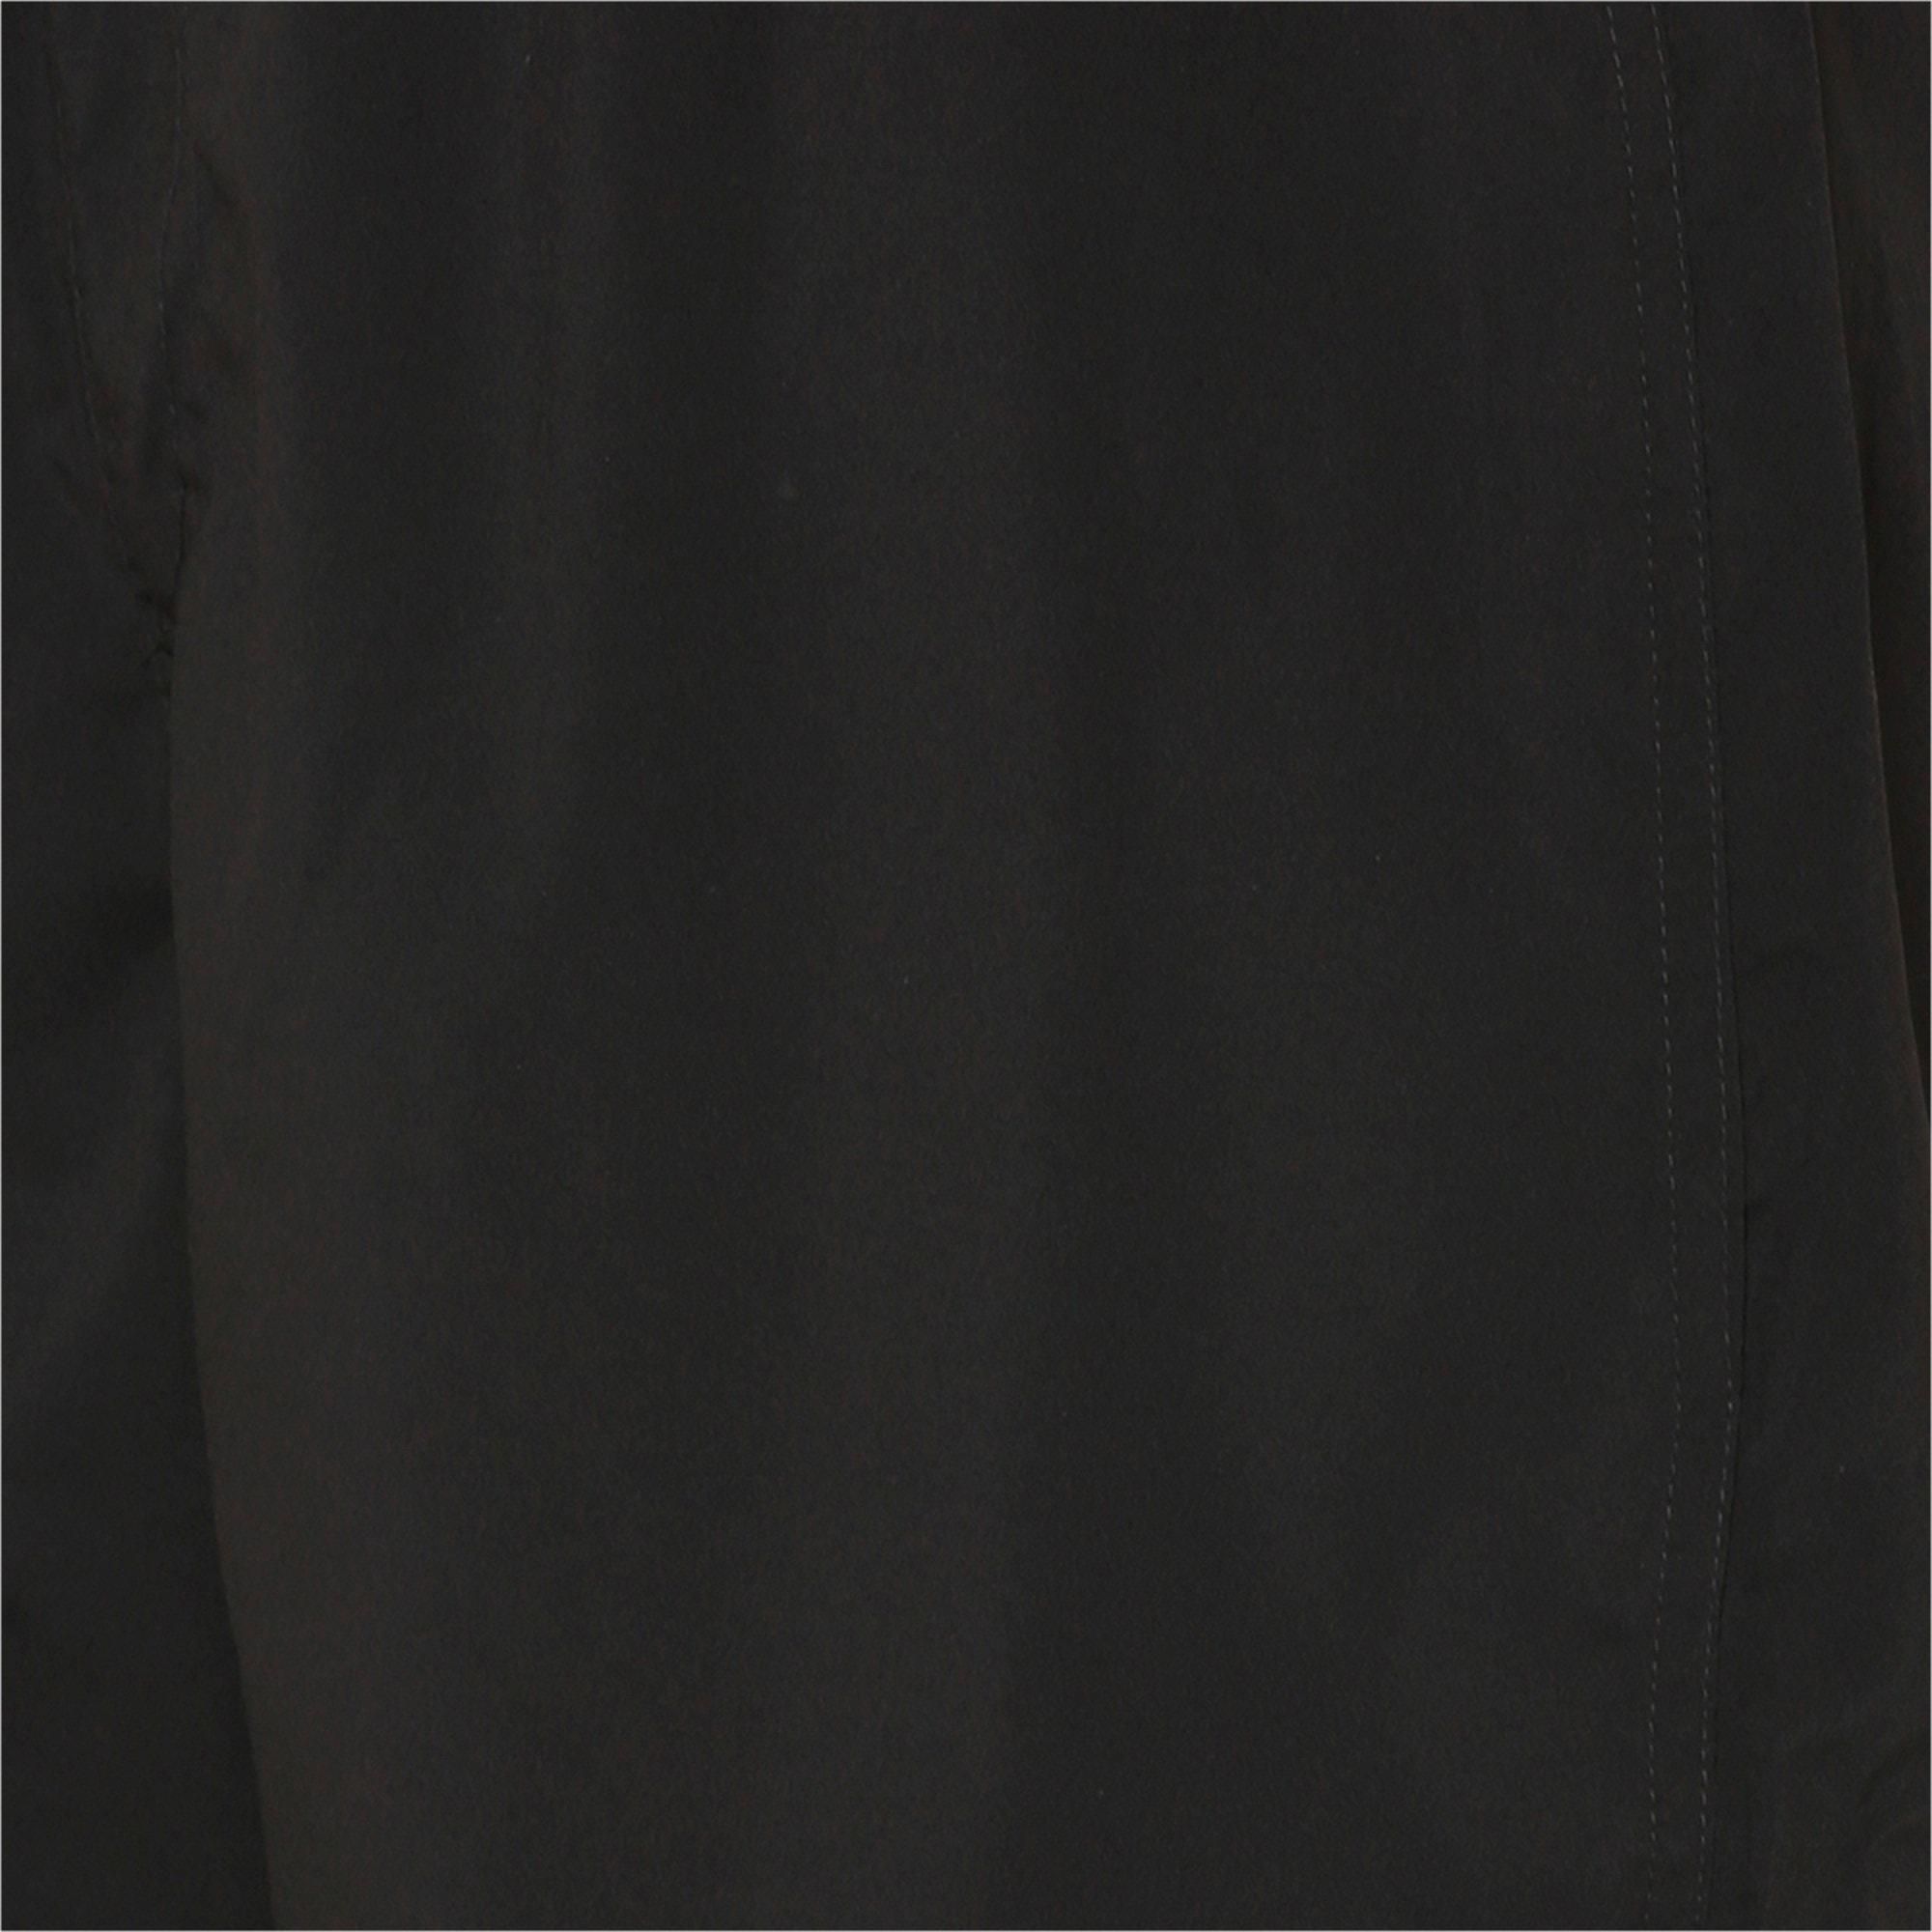 Thumbnail 6 of Running Men's IGNITE 2-in-1 Shorts, Puma Black, medium-IND